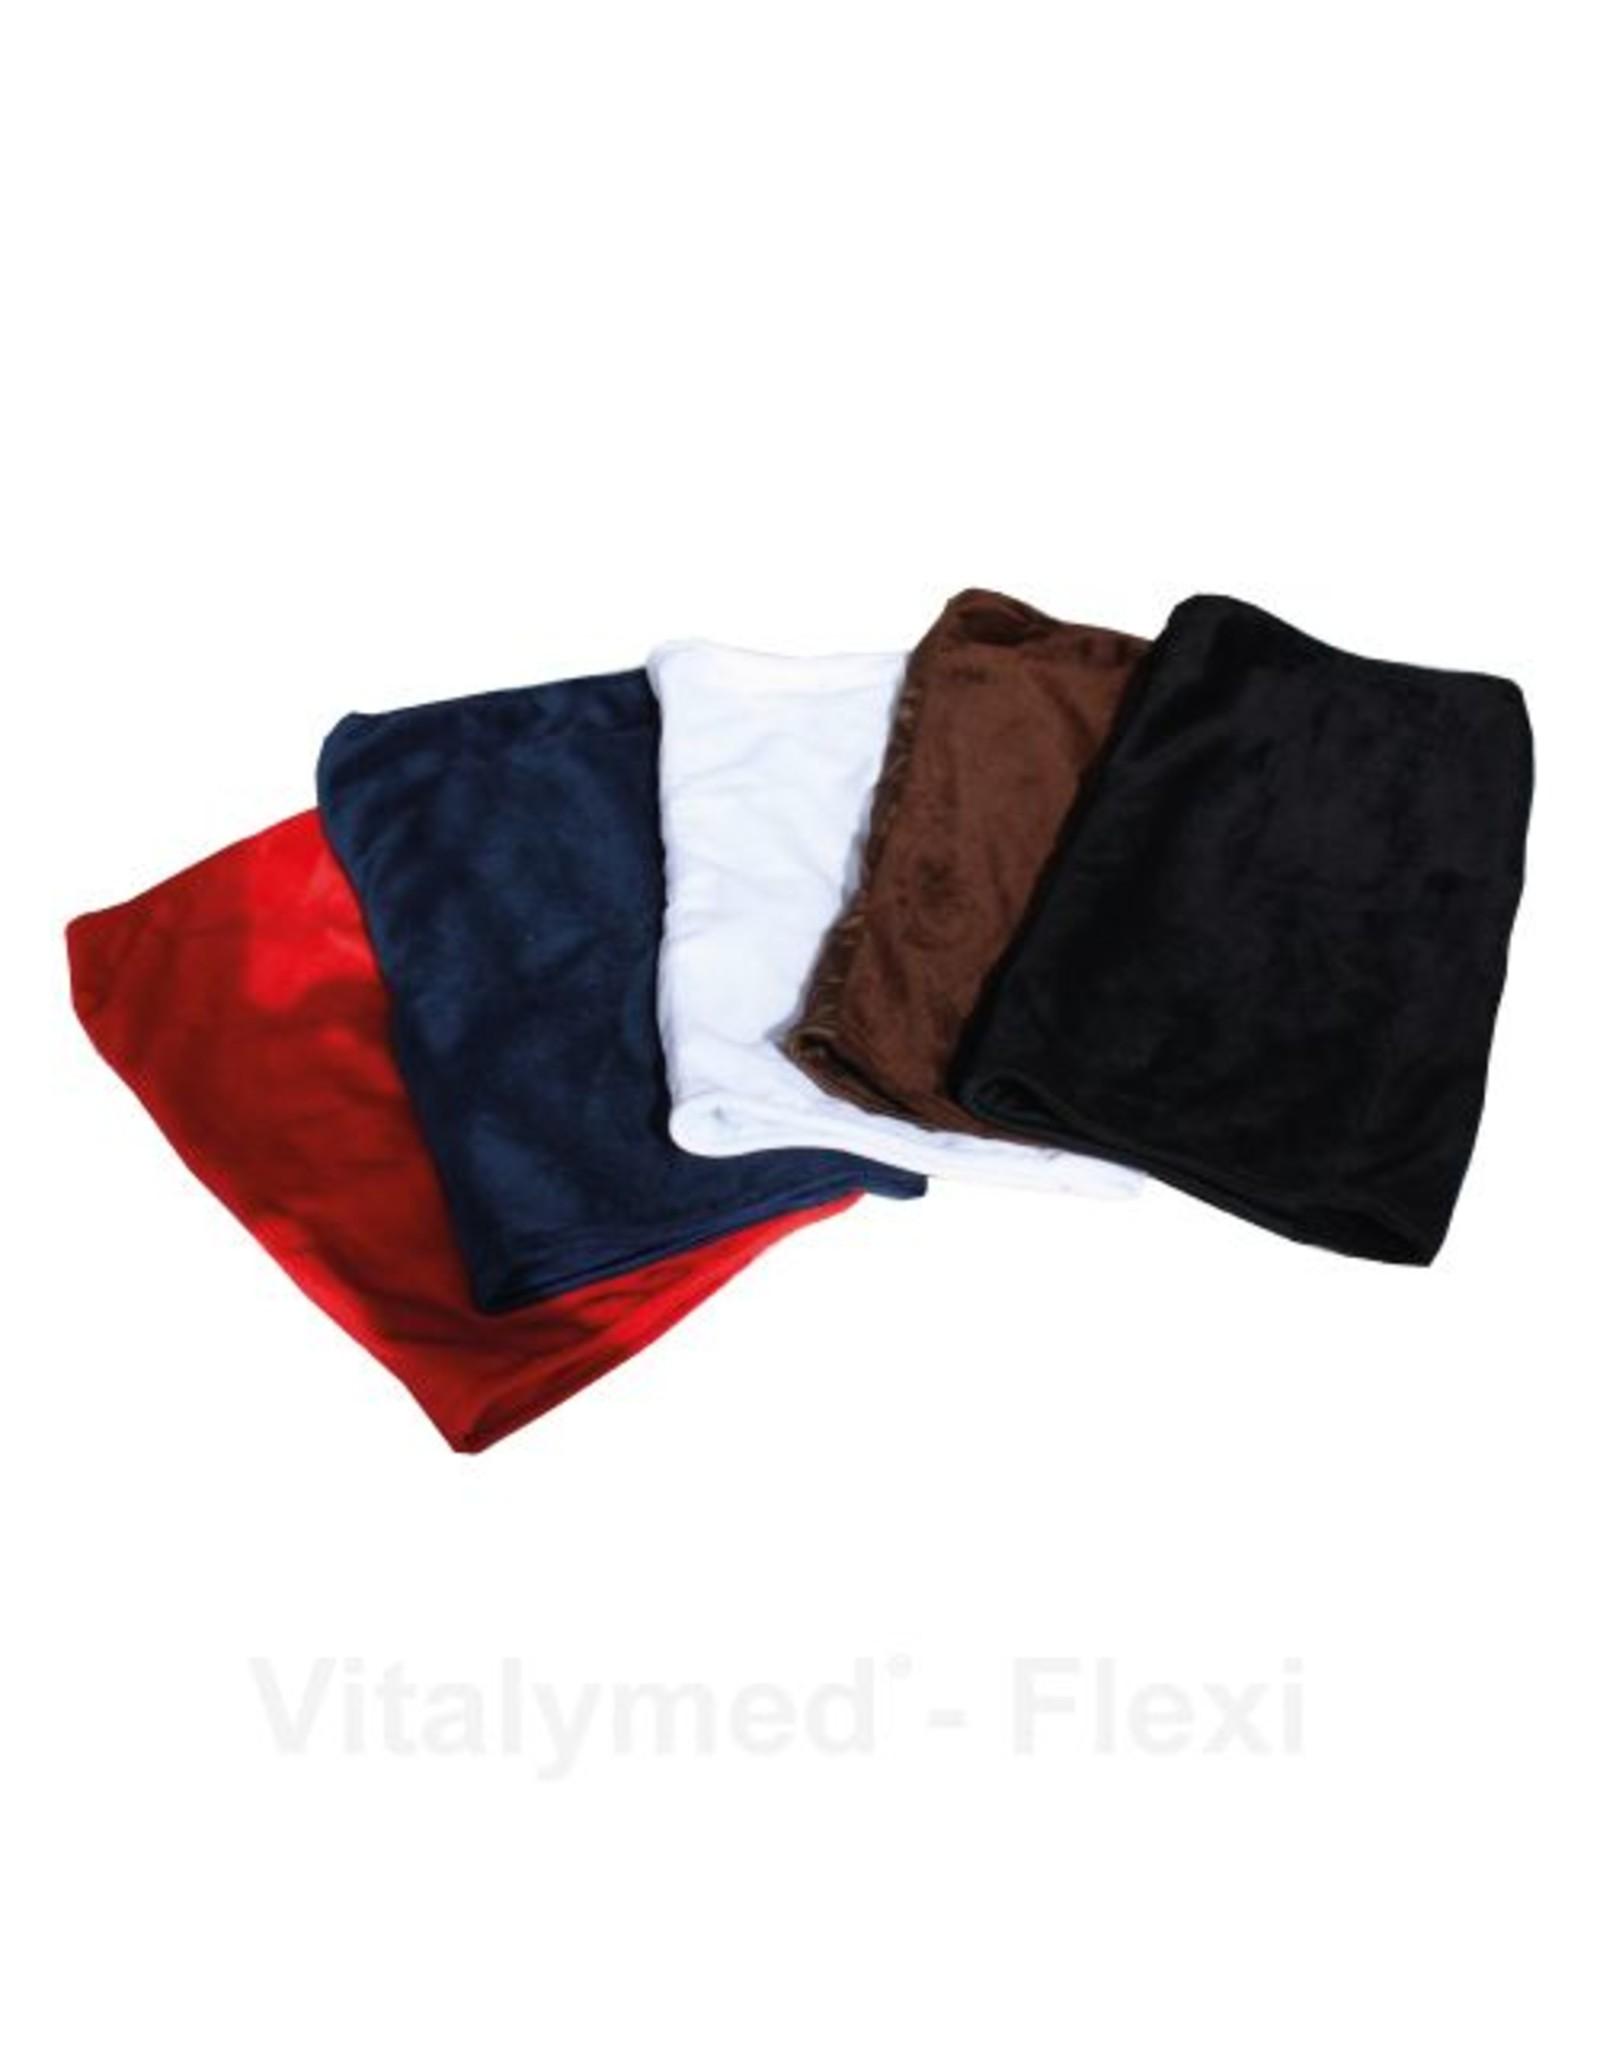 INVITALIS Vitalymed Flexi - Pillow Cover